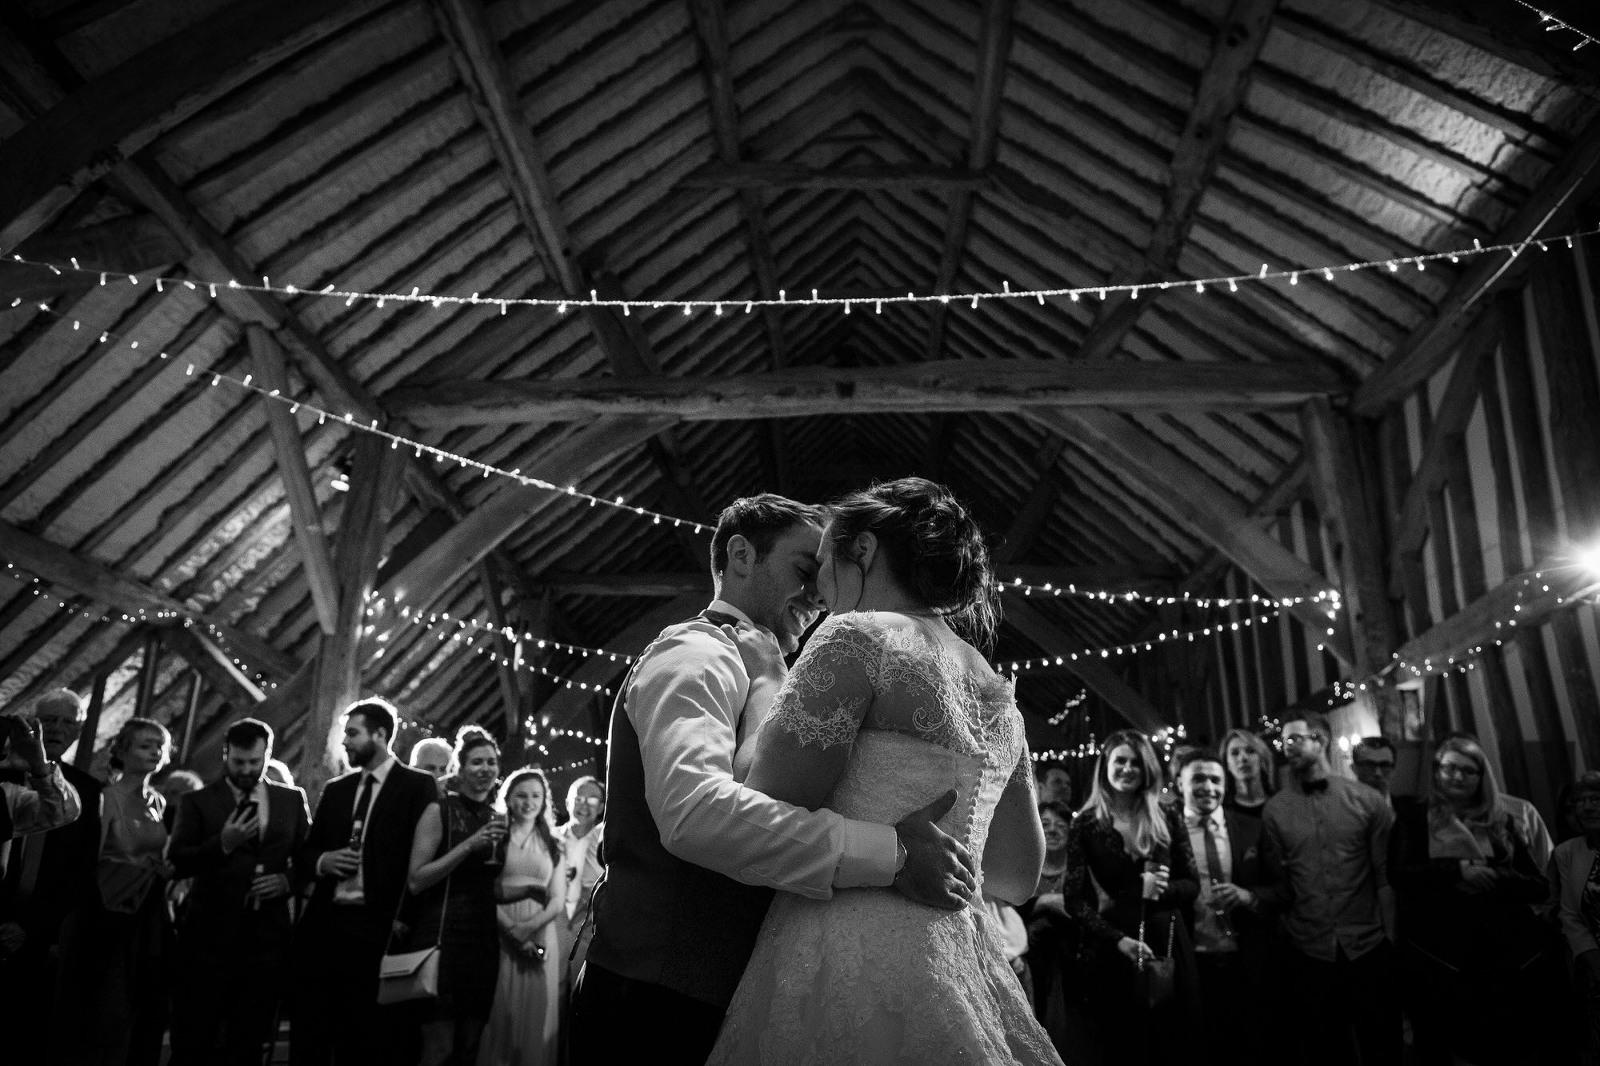 Kent Wedding Photographer - Bride and Groom dancing